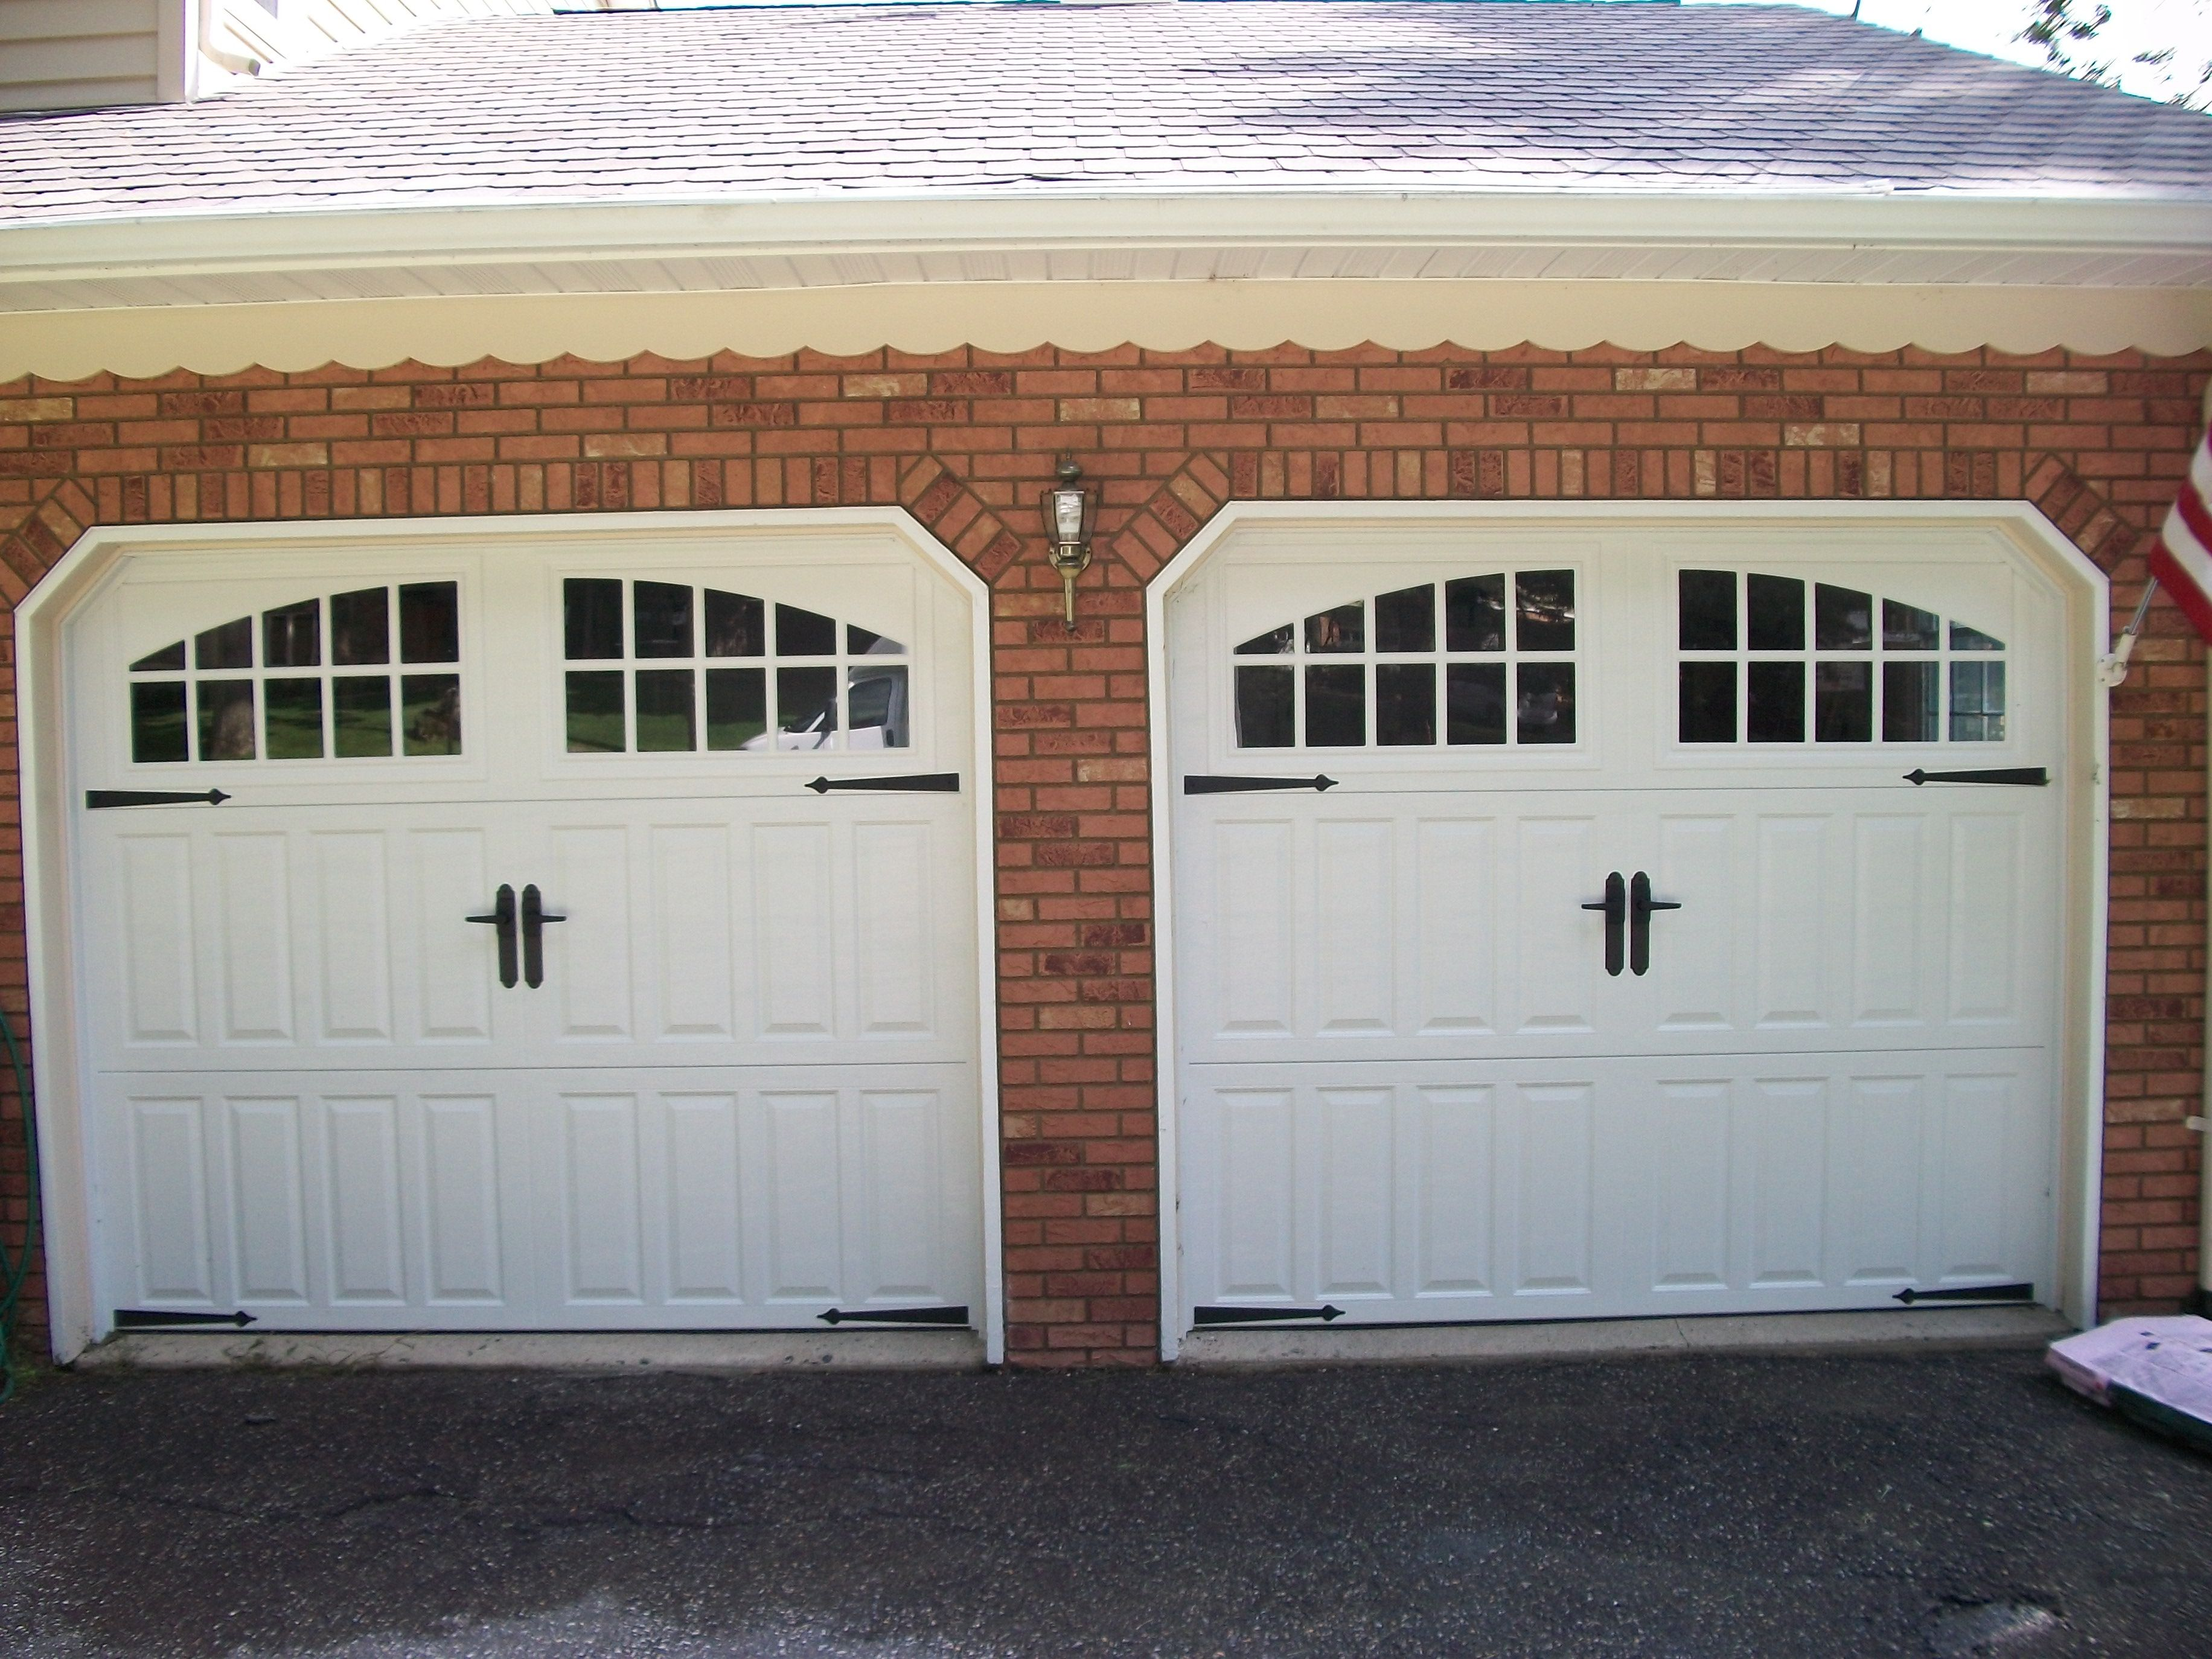 half ingenious rv ft height conceal foot garage to door engineering has tall appear its ingenius design